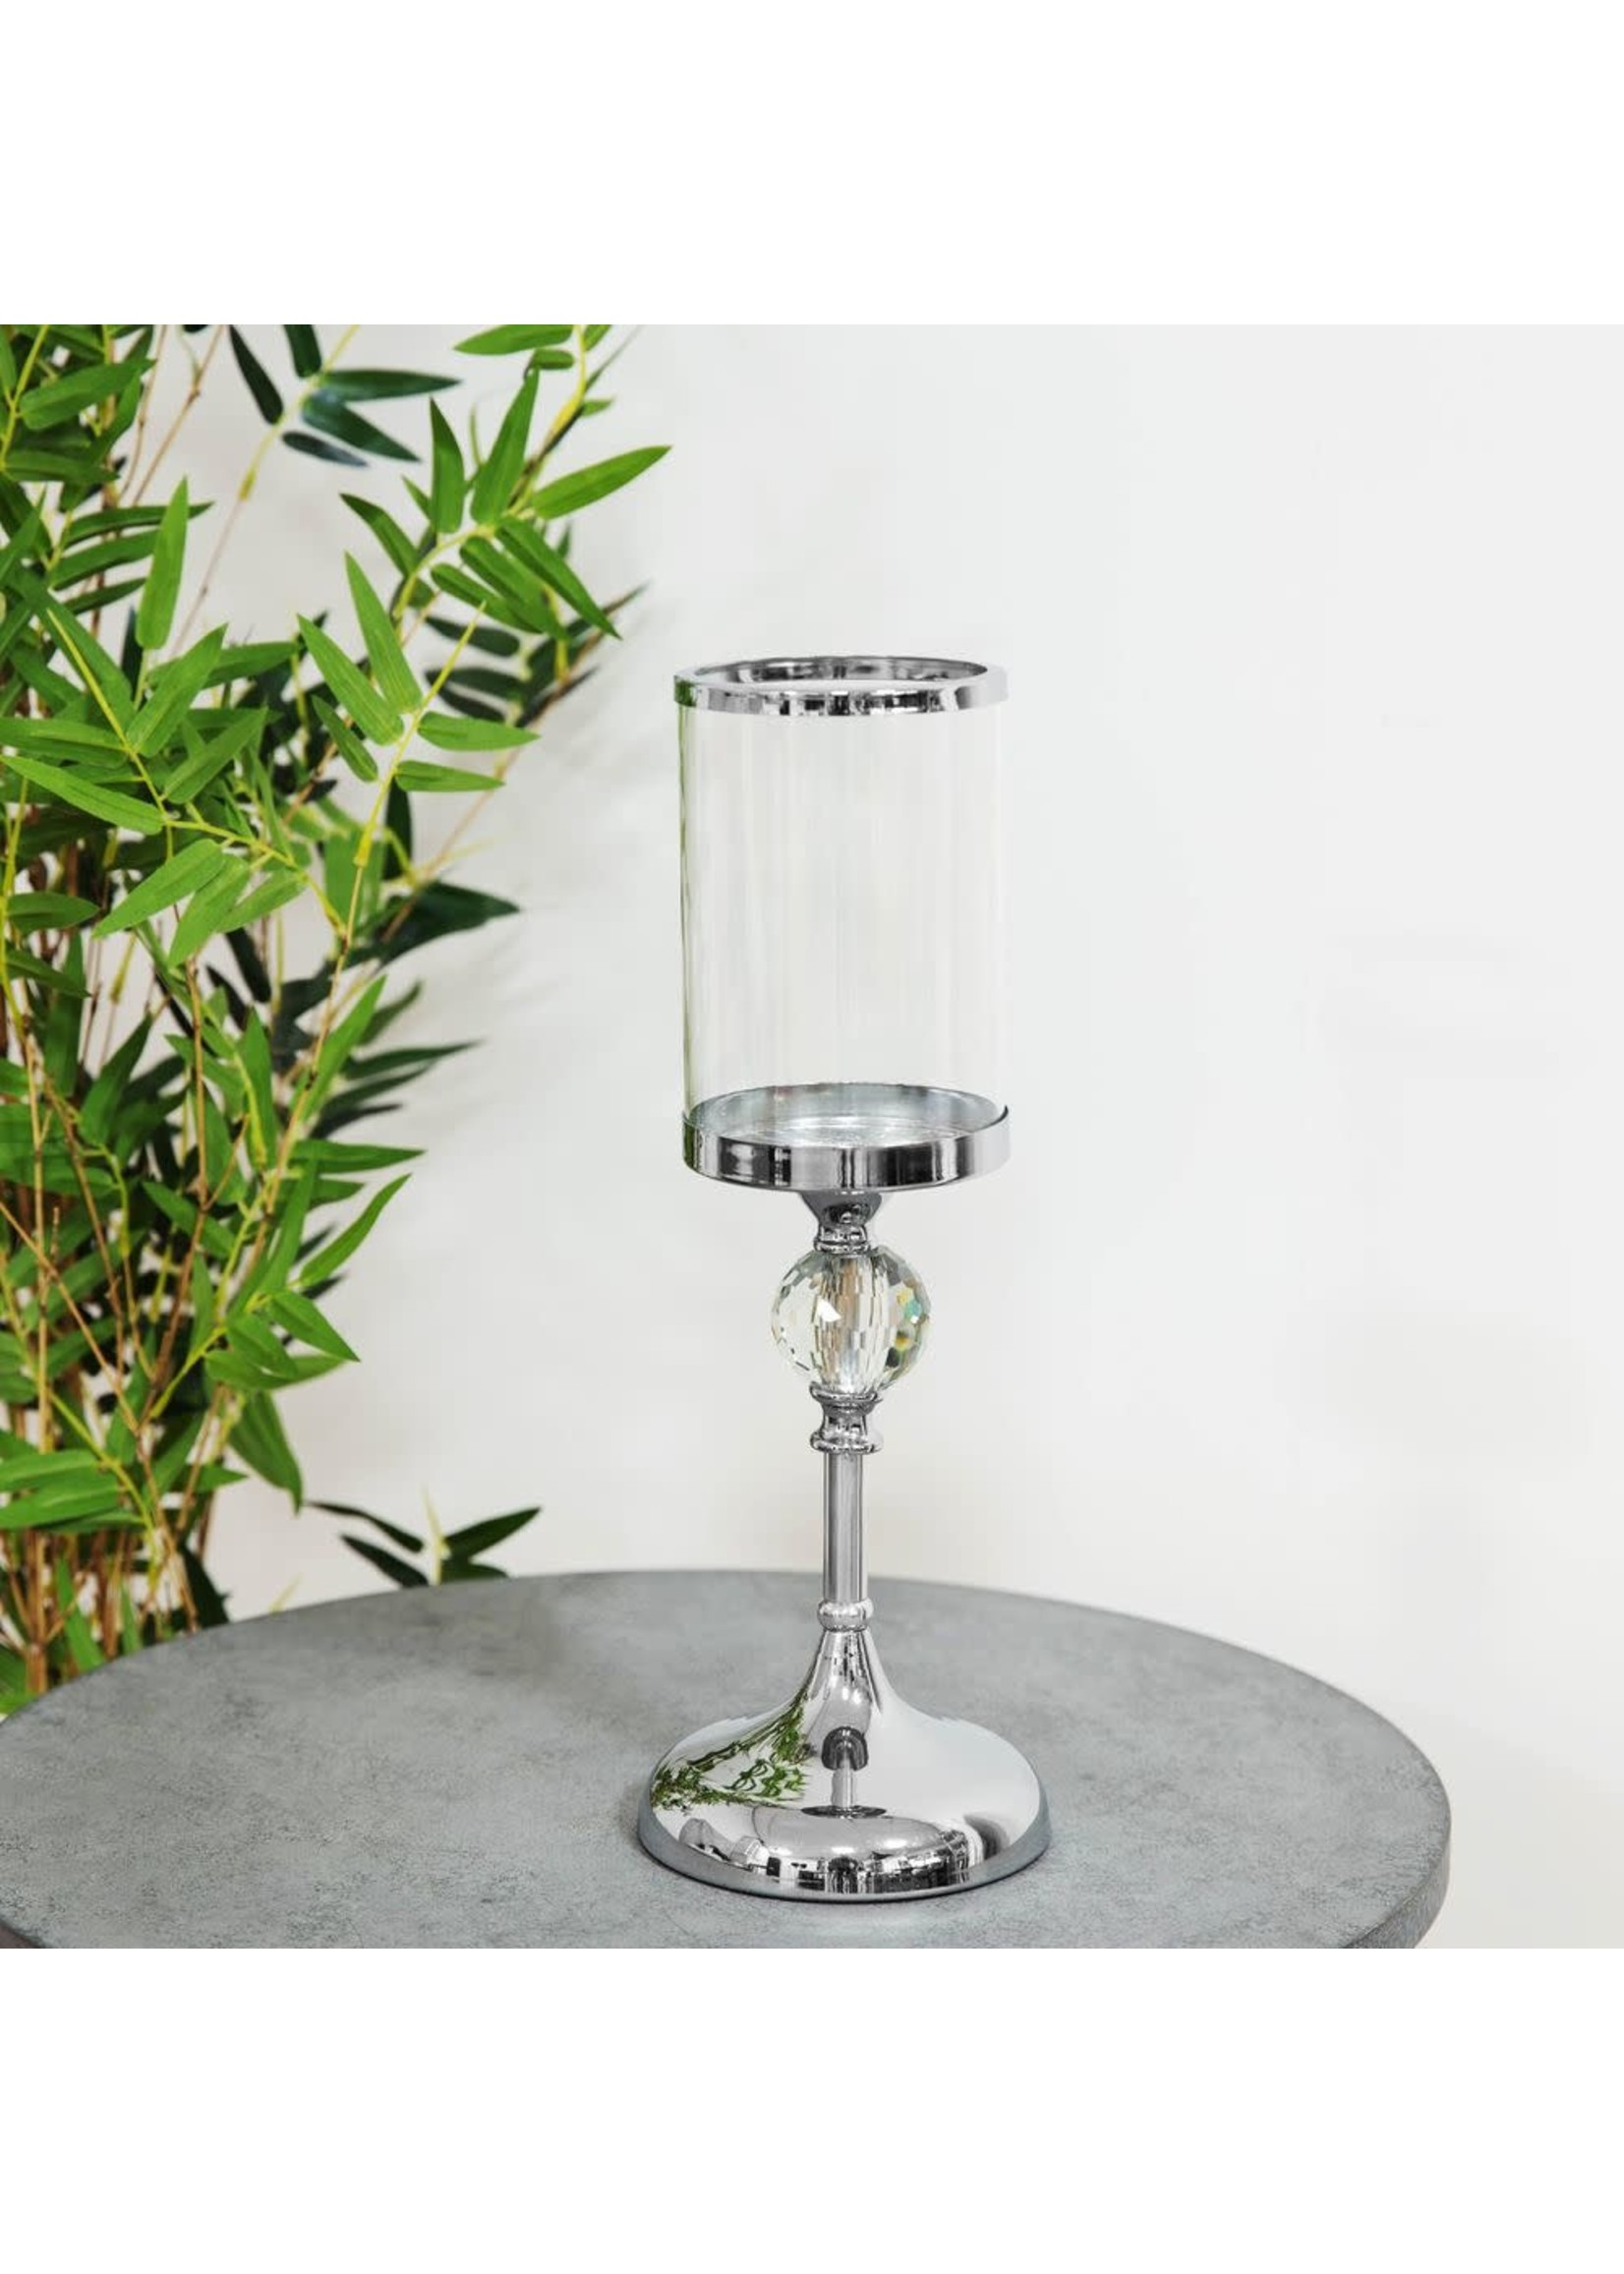 HESTIA® CHROME FINISH AND GLASS CANDLE HOLDER 23CM